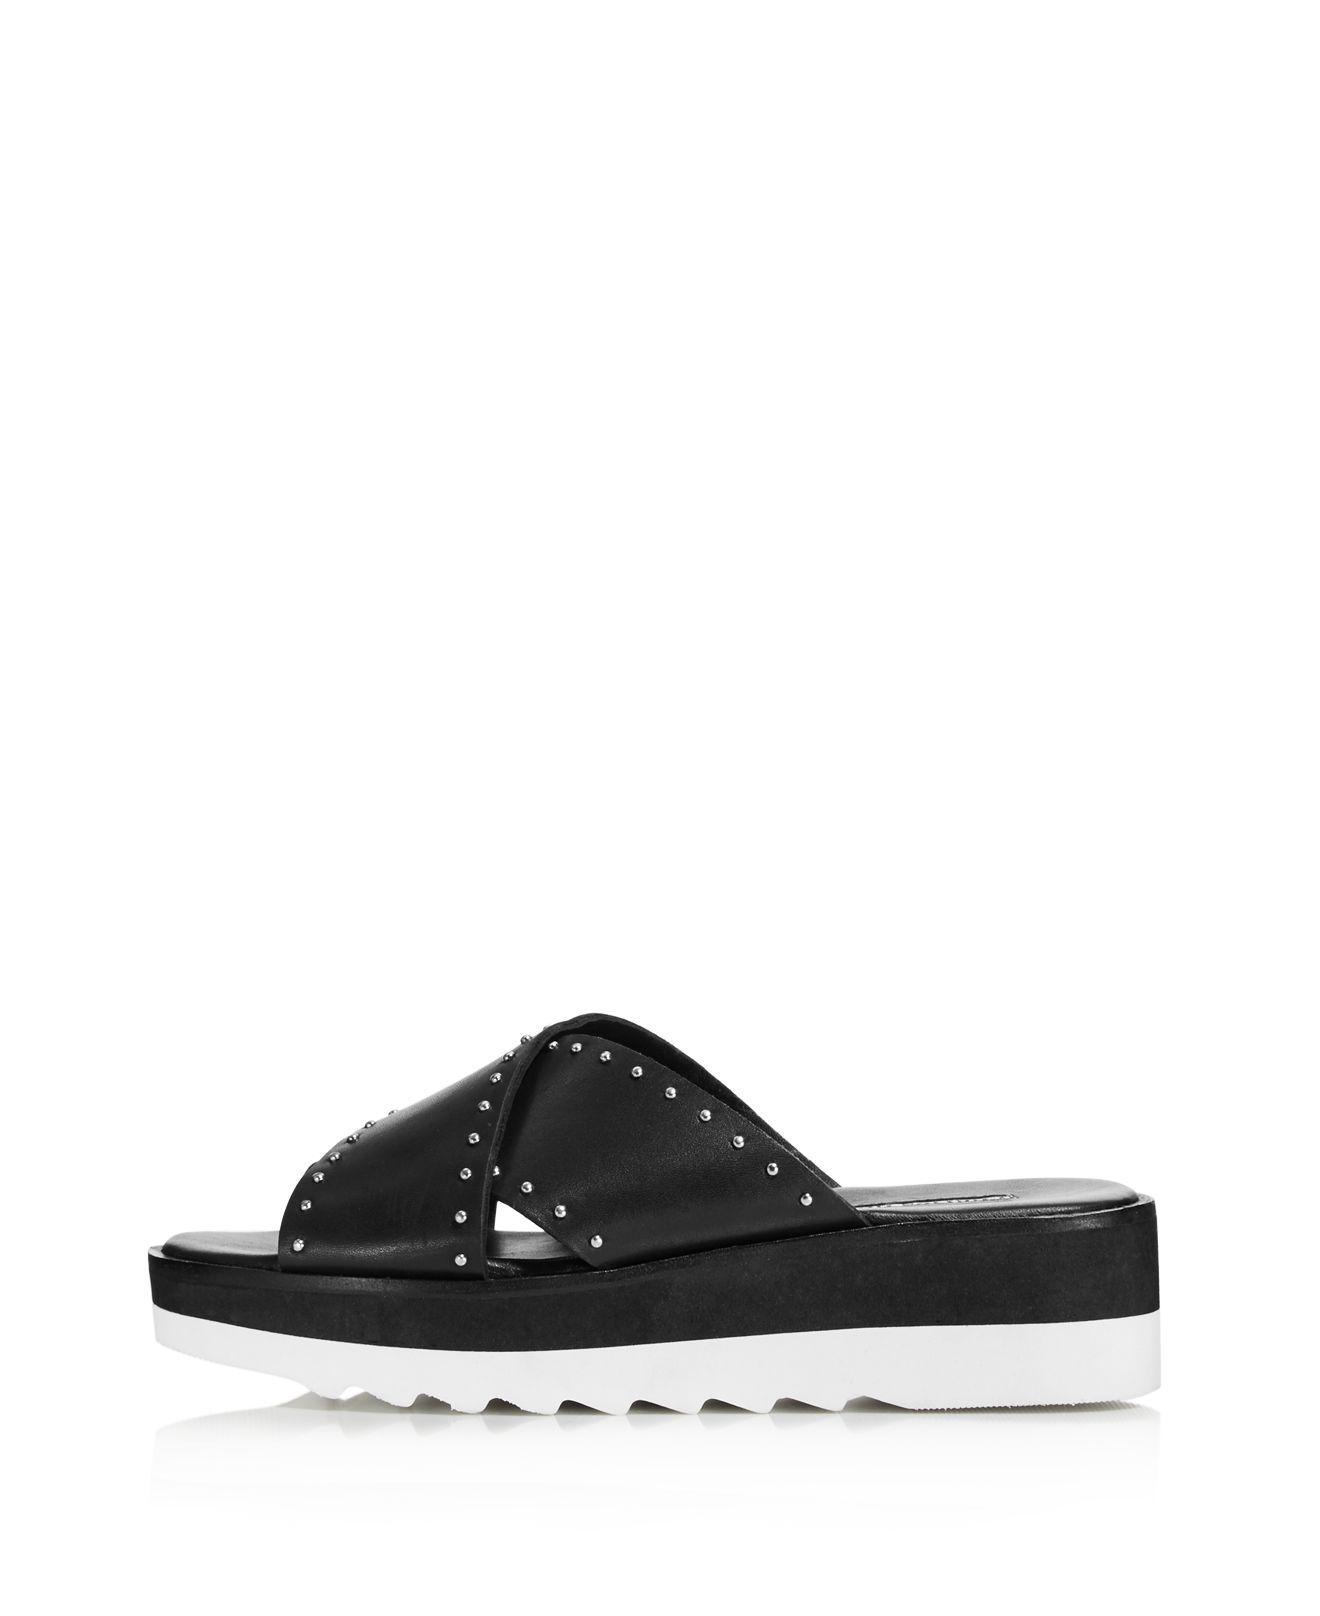 Charles David Women's Buxom Studded Leather Platform Slide Sandals bH02EDqA